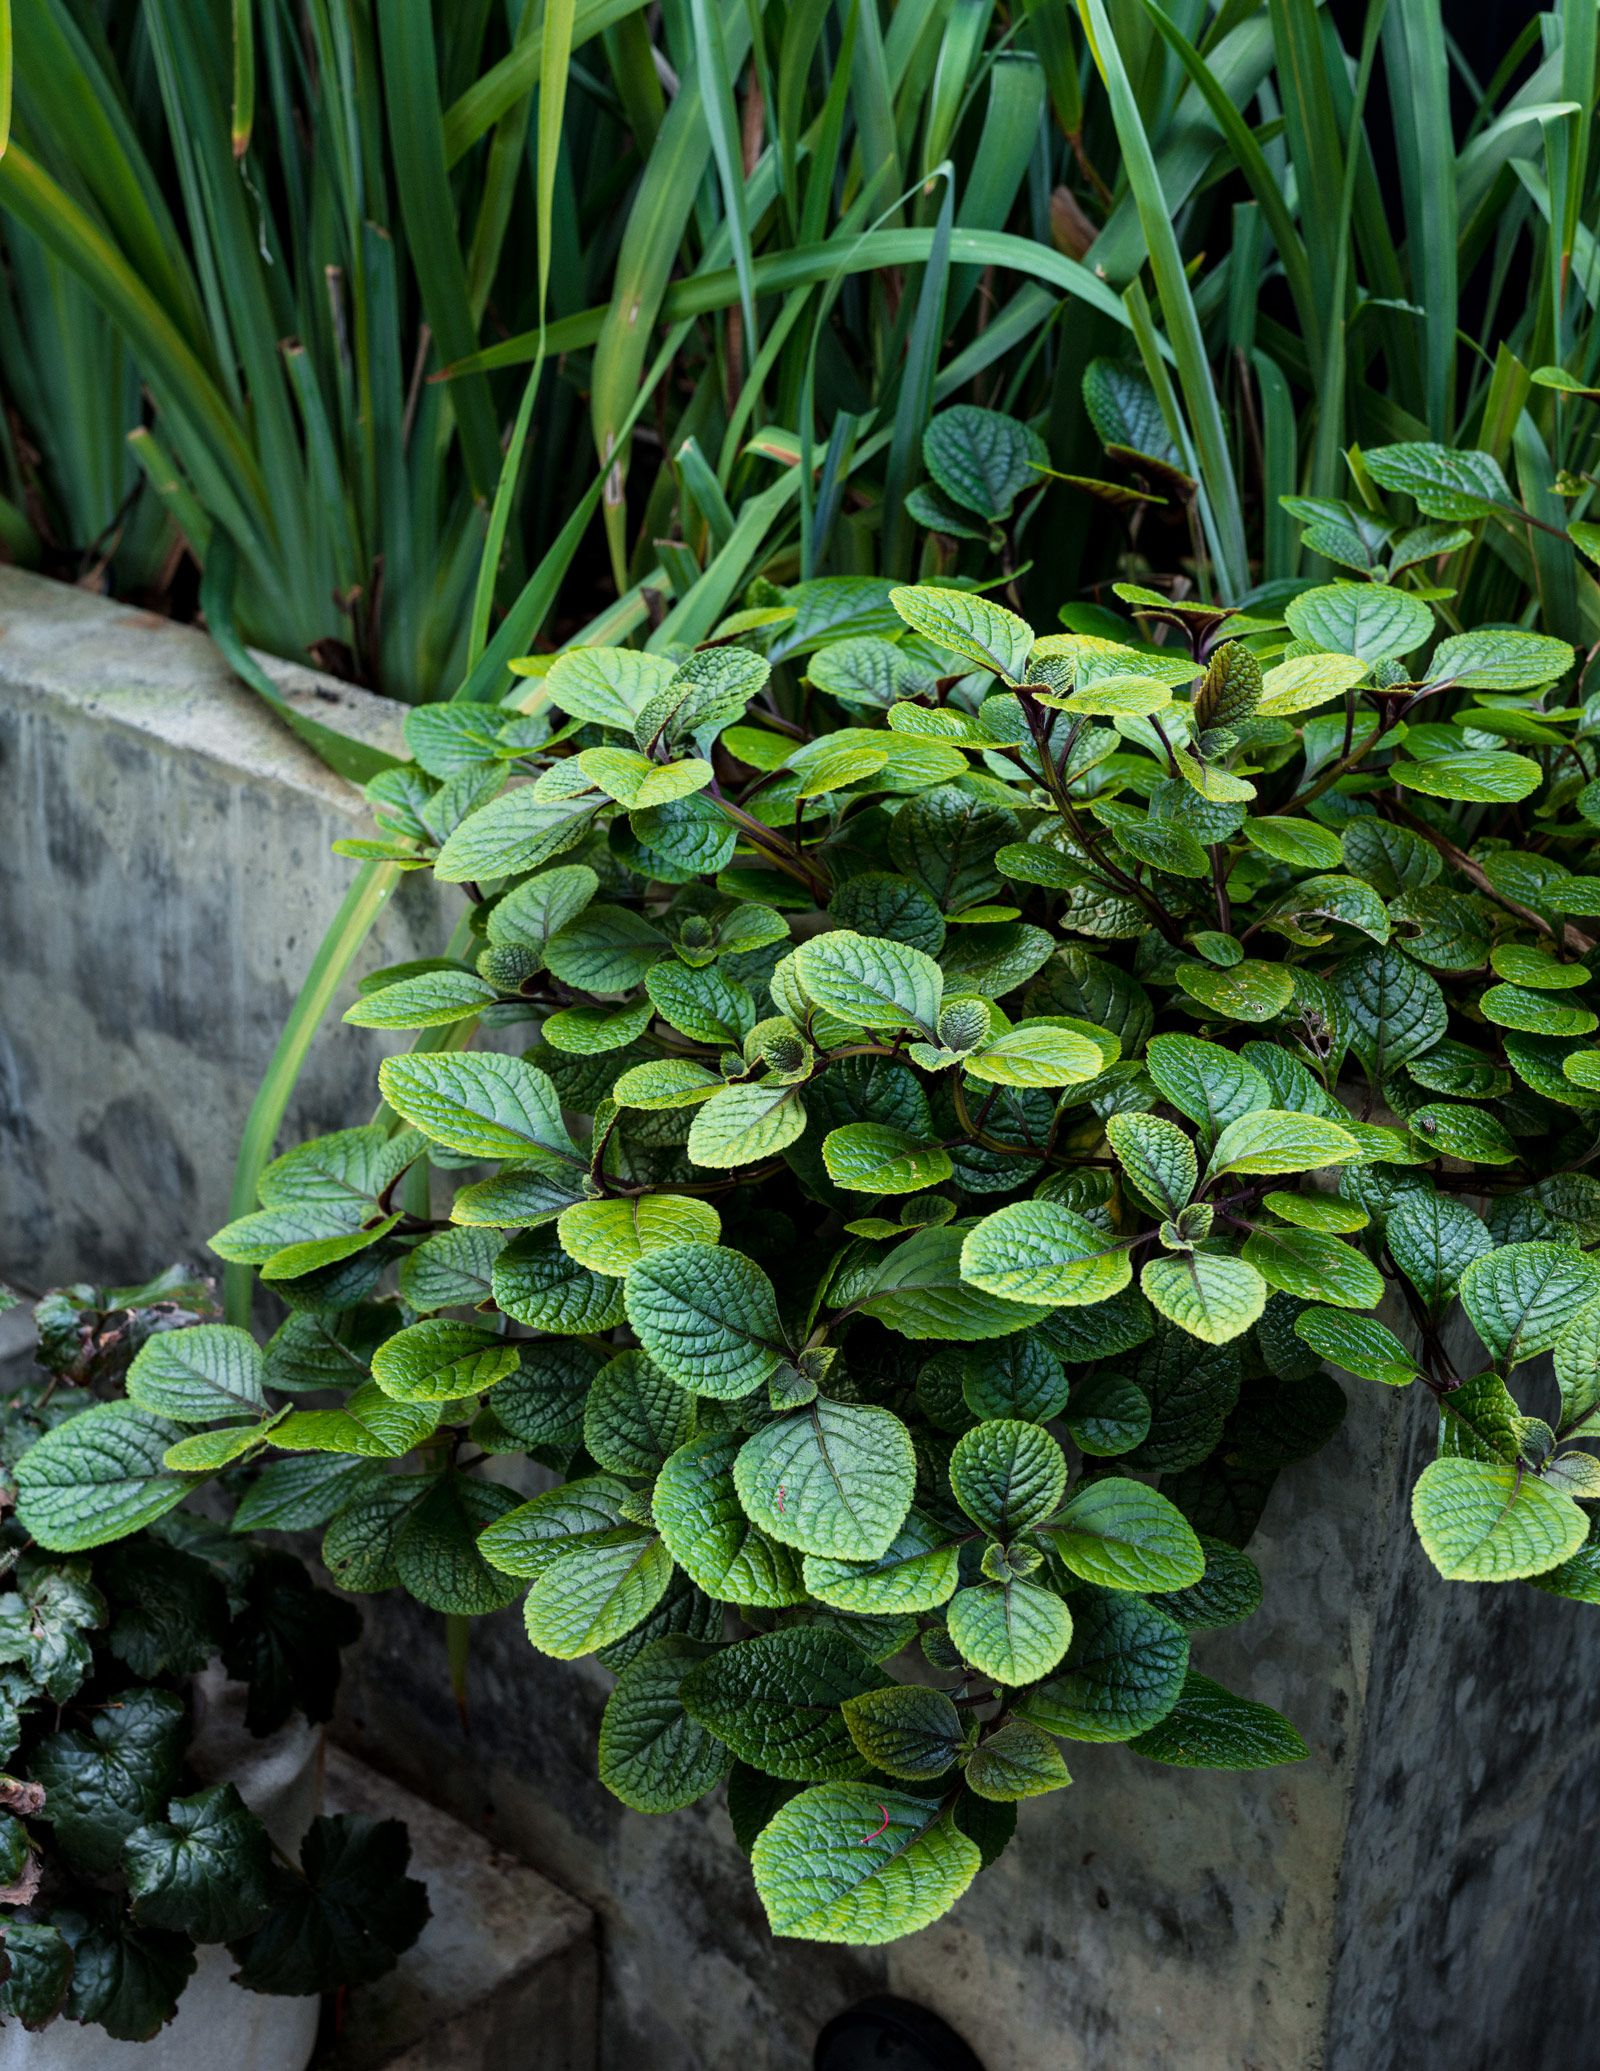 Plant/Life: Sean Cook | Plants, Drought tolerant garden